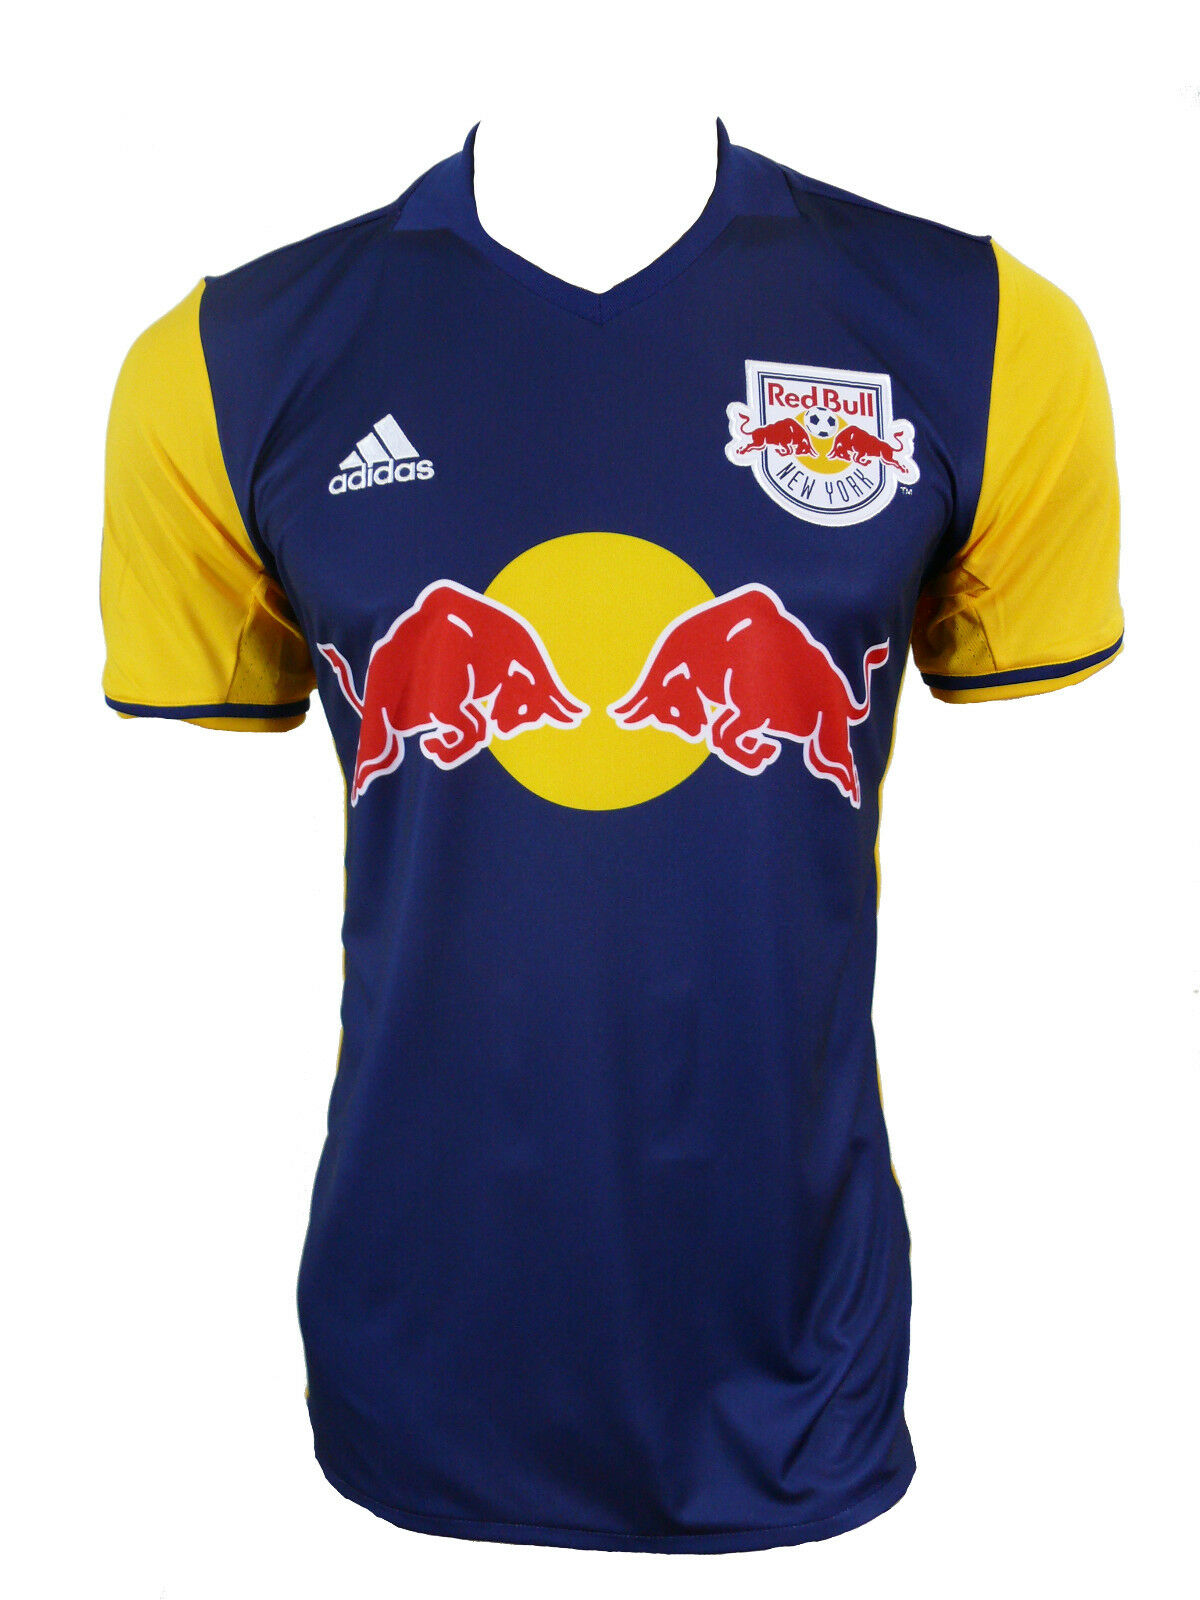 4b617ad8ee2 Red Bull New York Adidas Camiseta Camiseta Camiseta Visitante Bulls Mls size  S 70eaf5